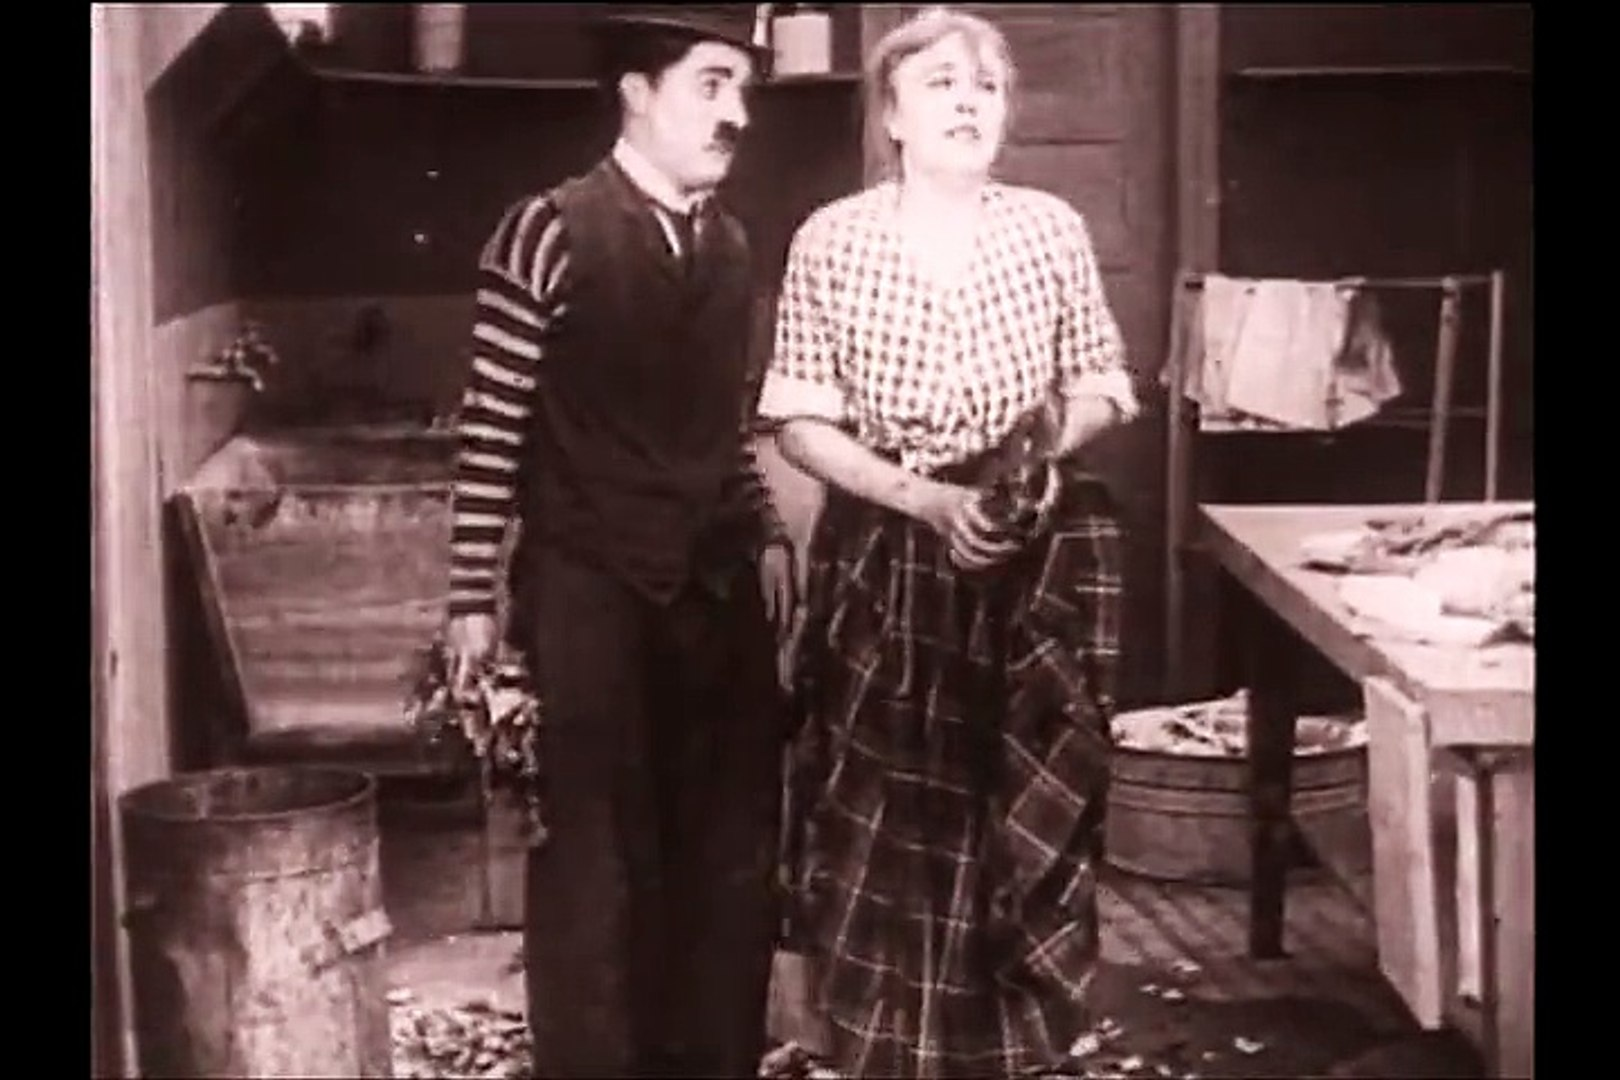 Charlie Chaplin: Triple Trouble (Early Silent Film) 1918